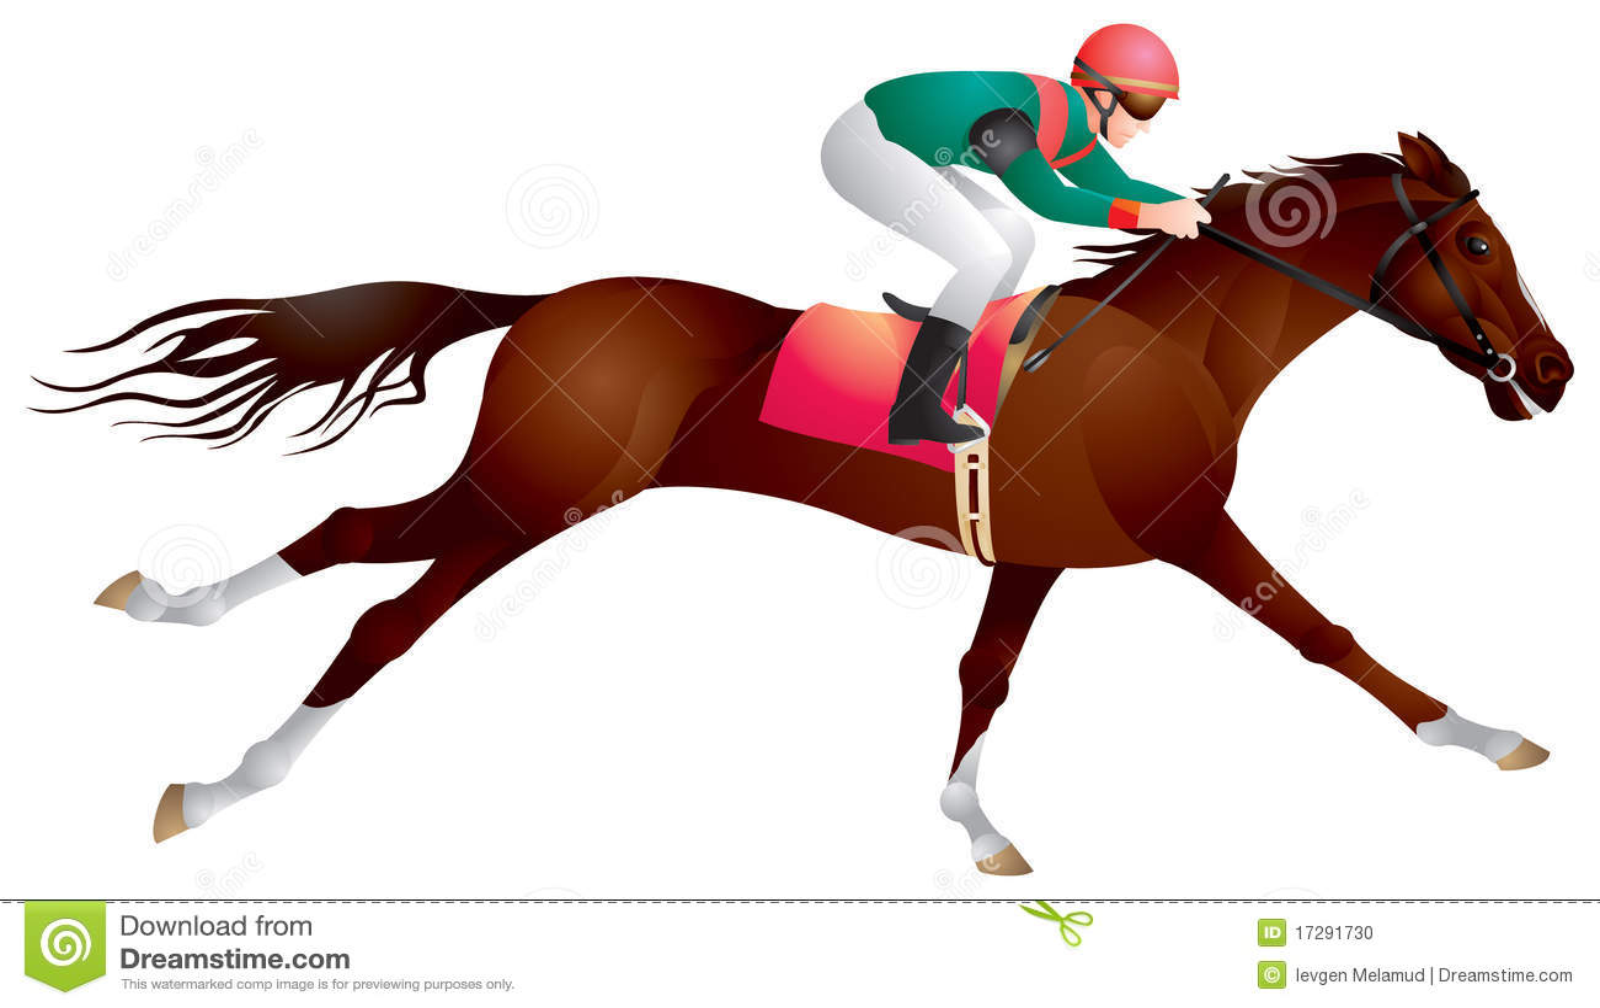 caballo y jinete del deporte ecuestre adentro ilustraci u00f3n Wipe Out Clip Art Kentucky Derby Clip Art